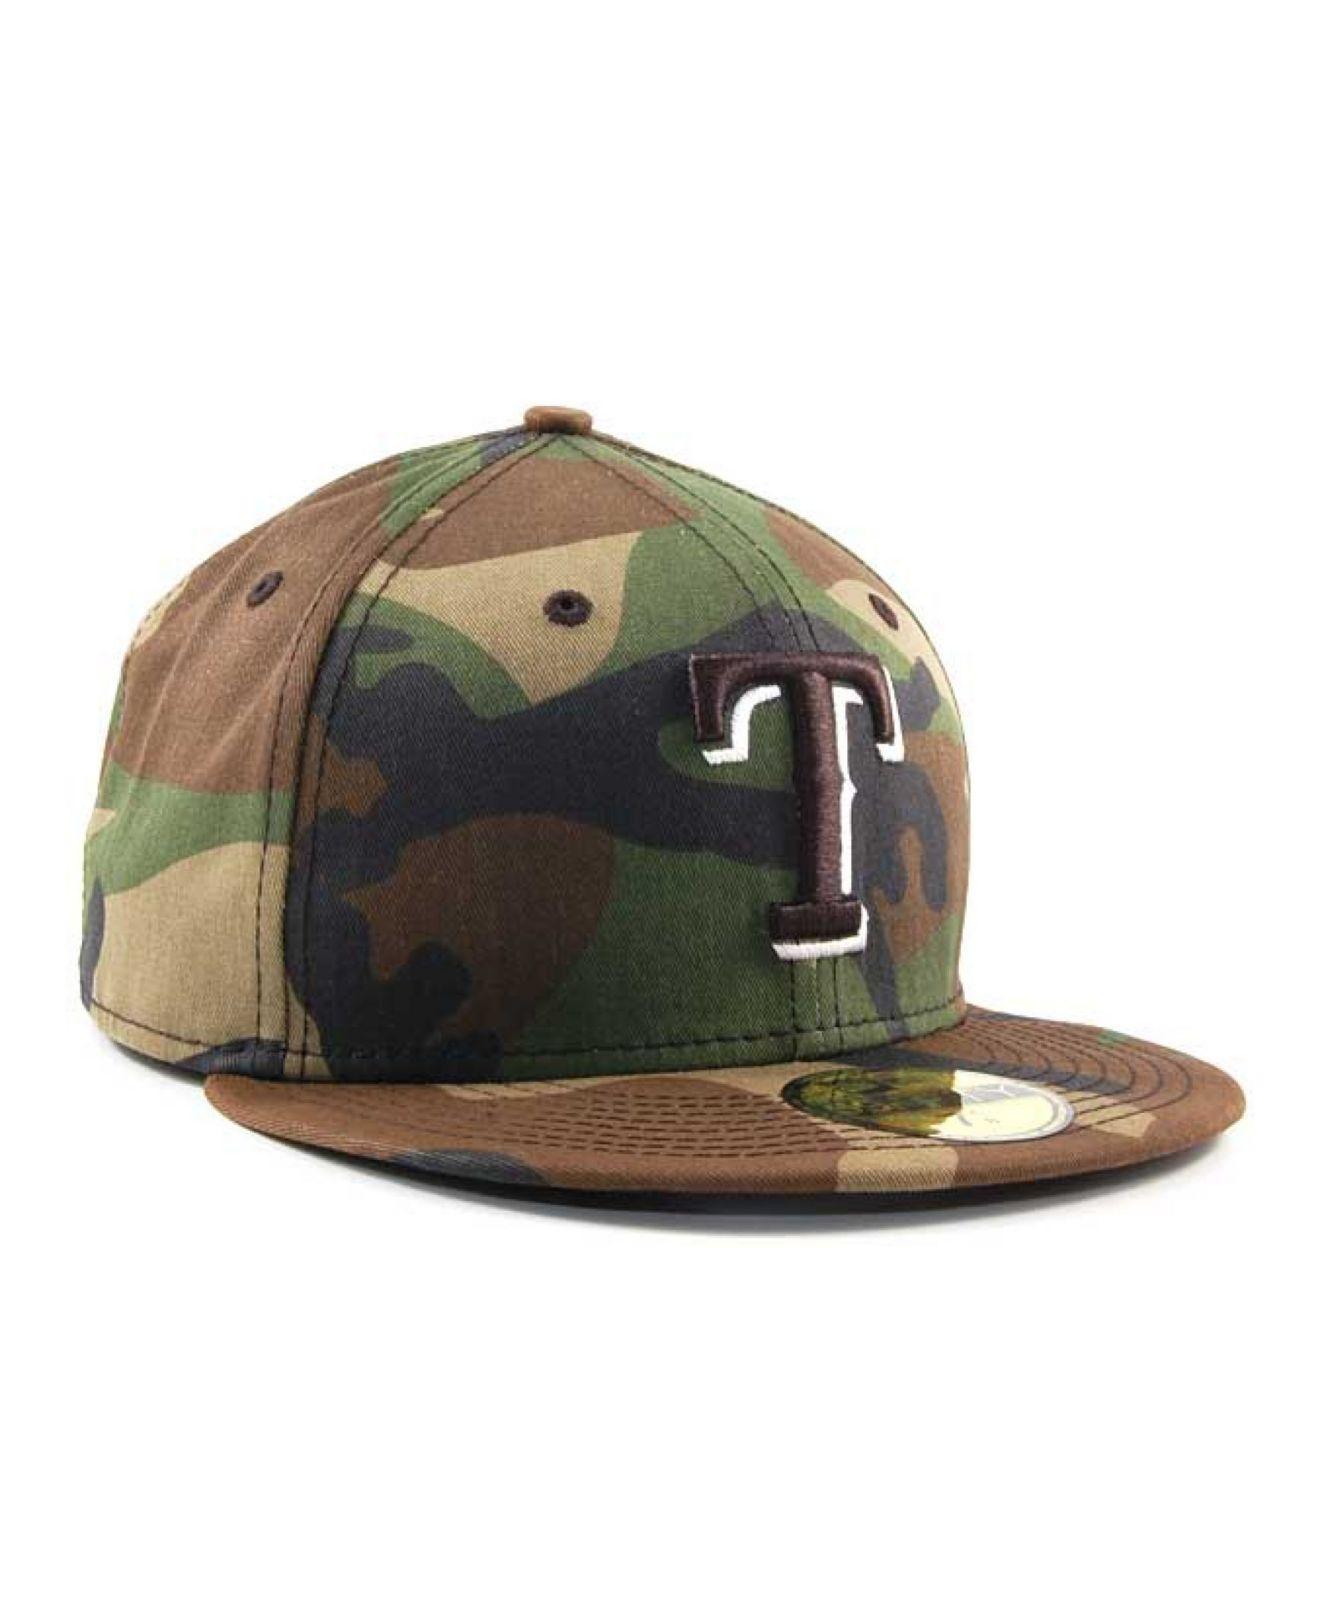 amazon texas rangers baseball camo hat nyc 39241 7511b ec6f6e786ef